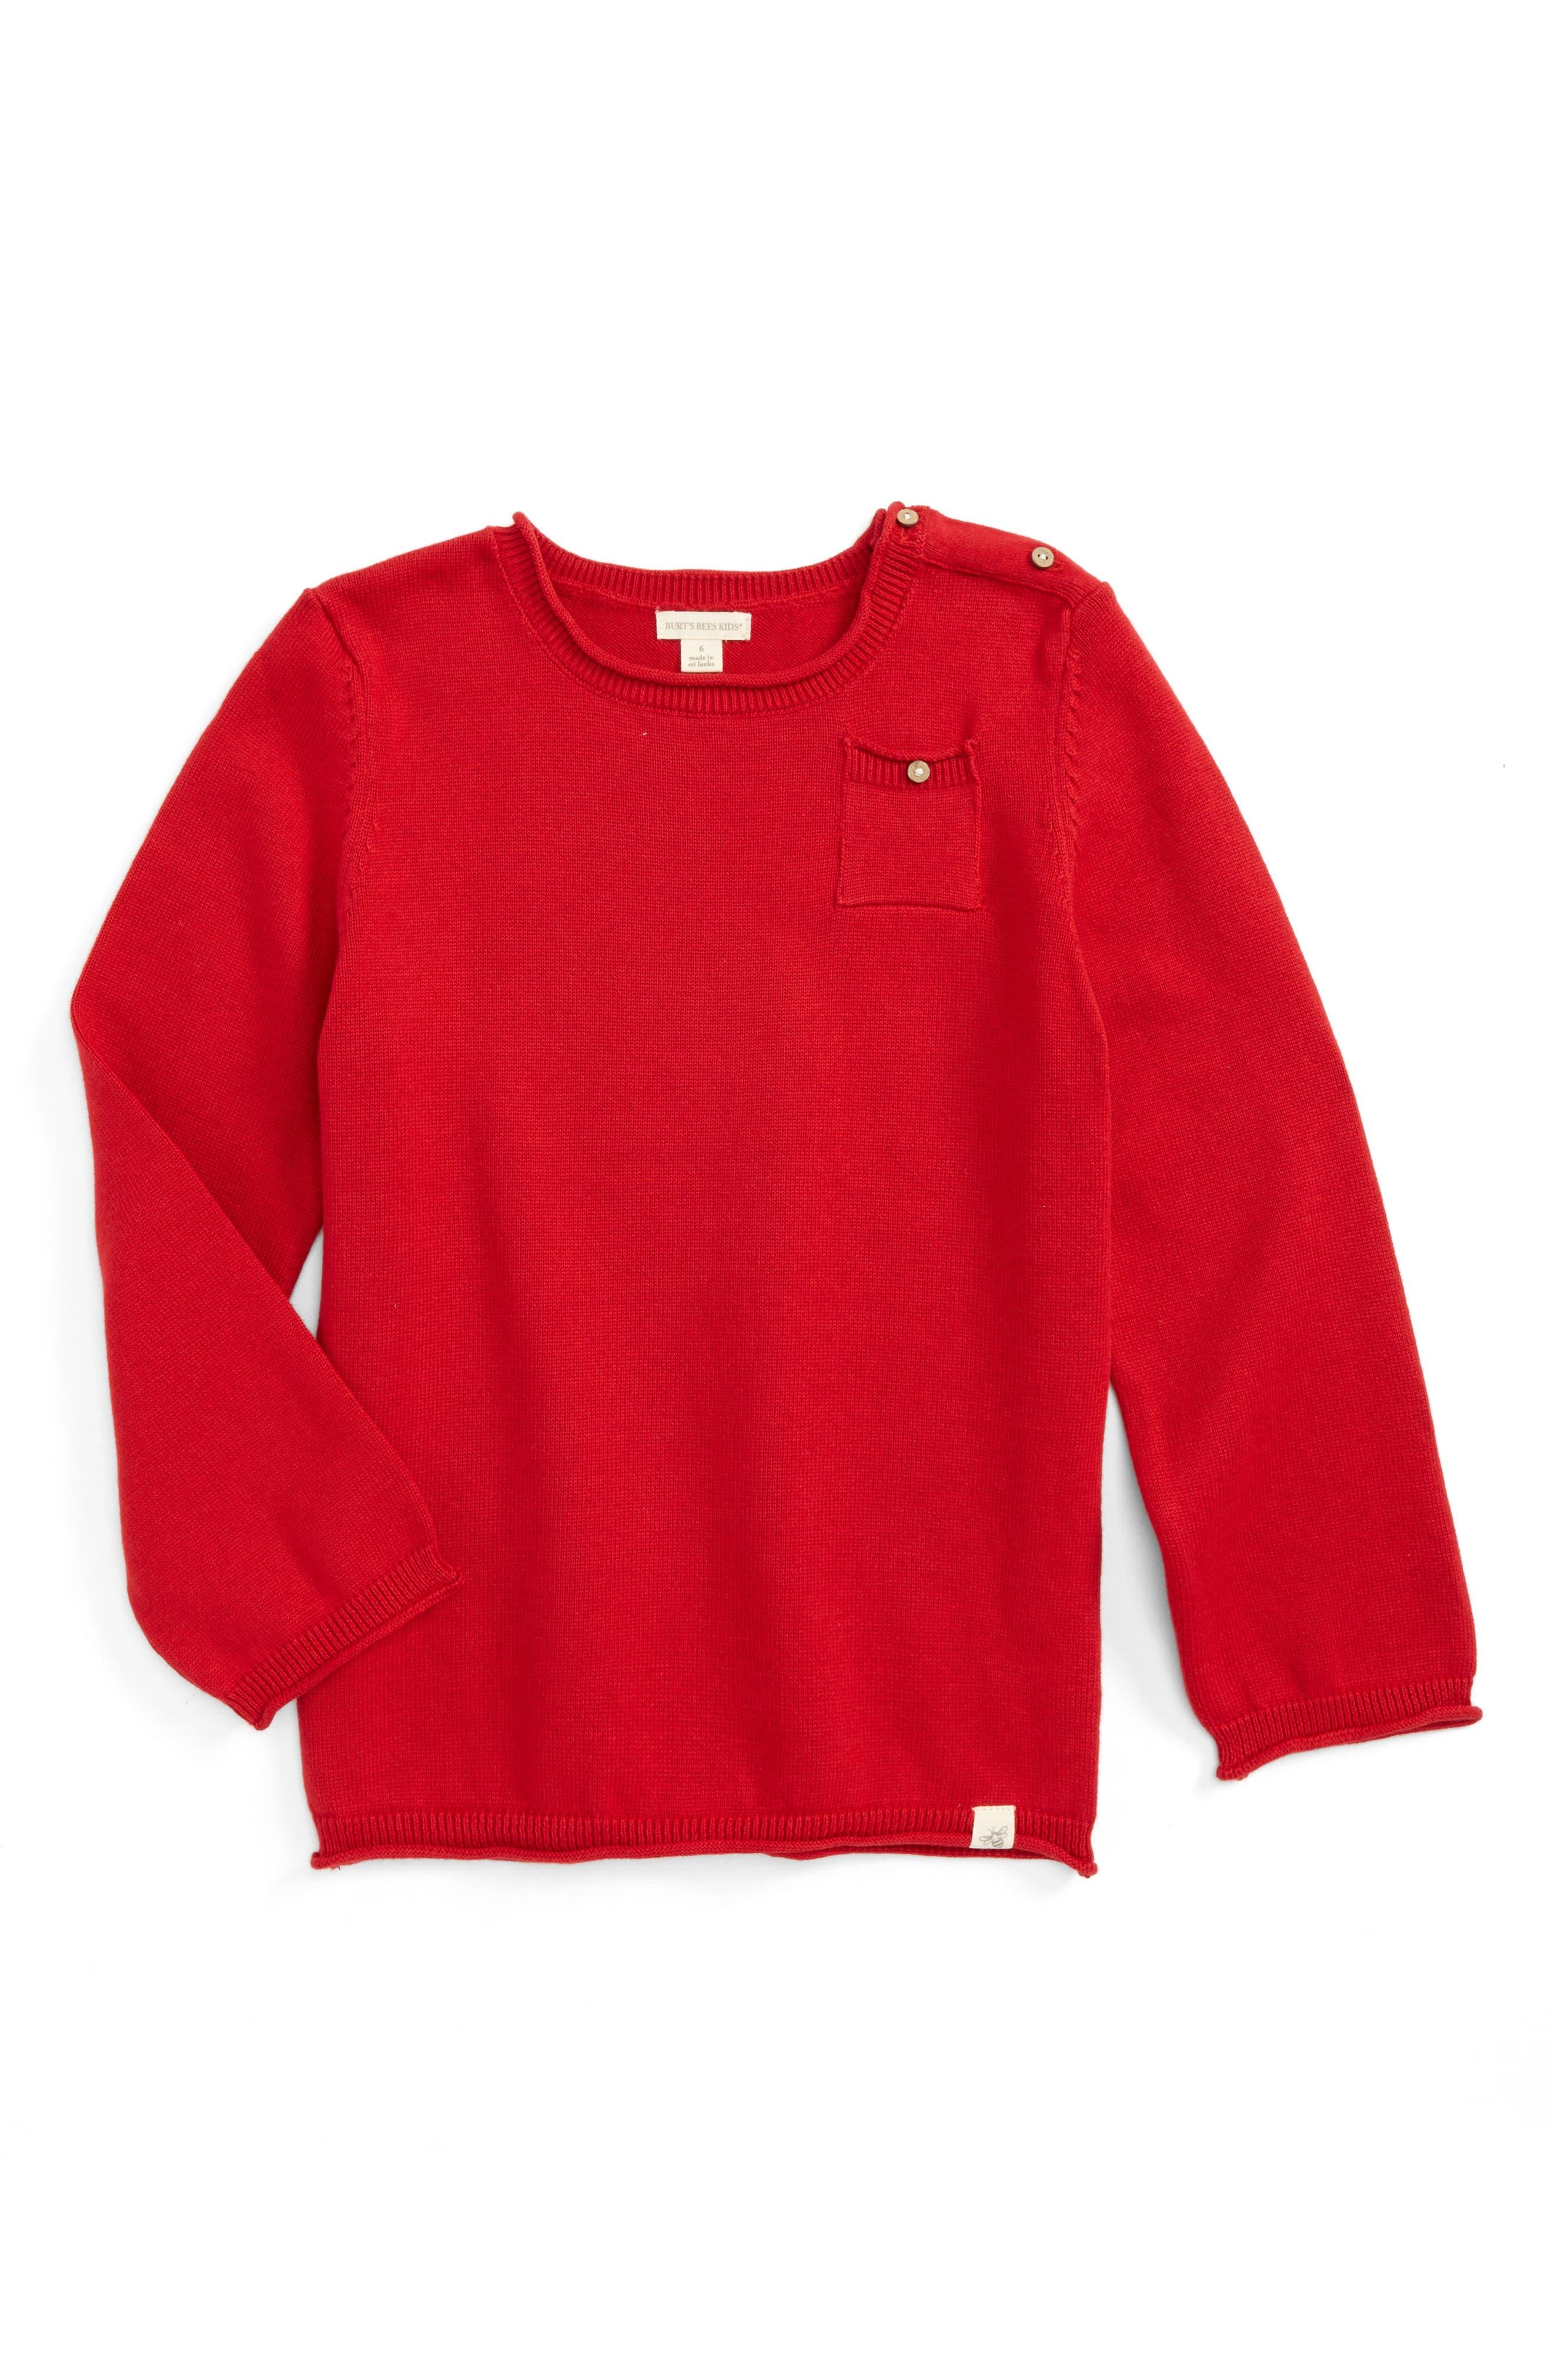 Pocket Organic Cotton Sweater,                             Main thumbnail 1, color,                             620